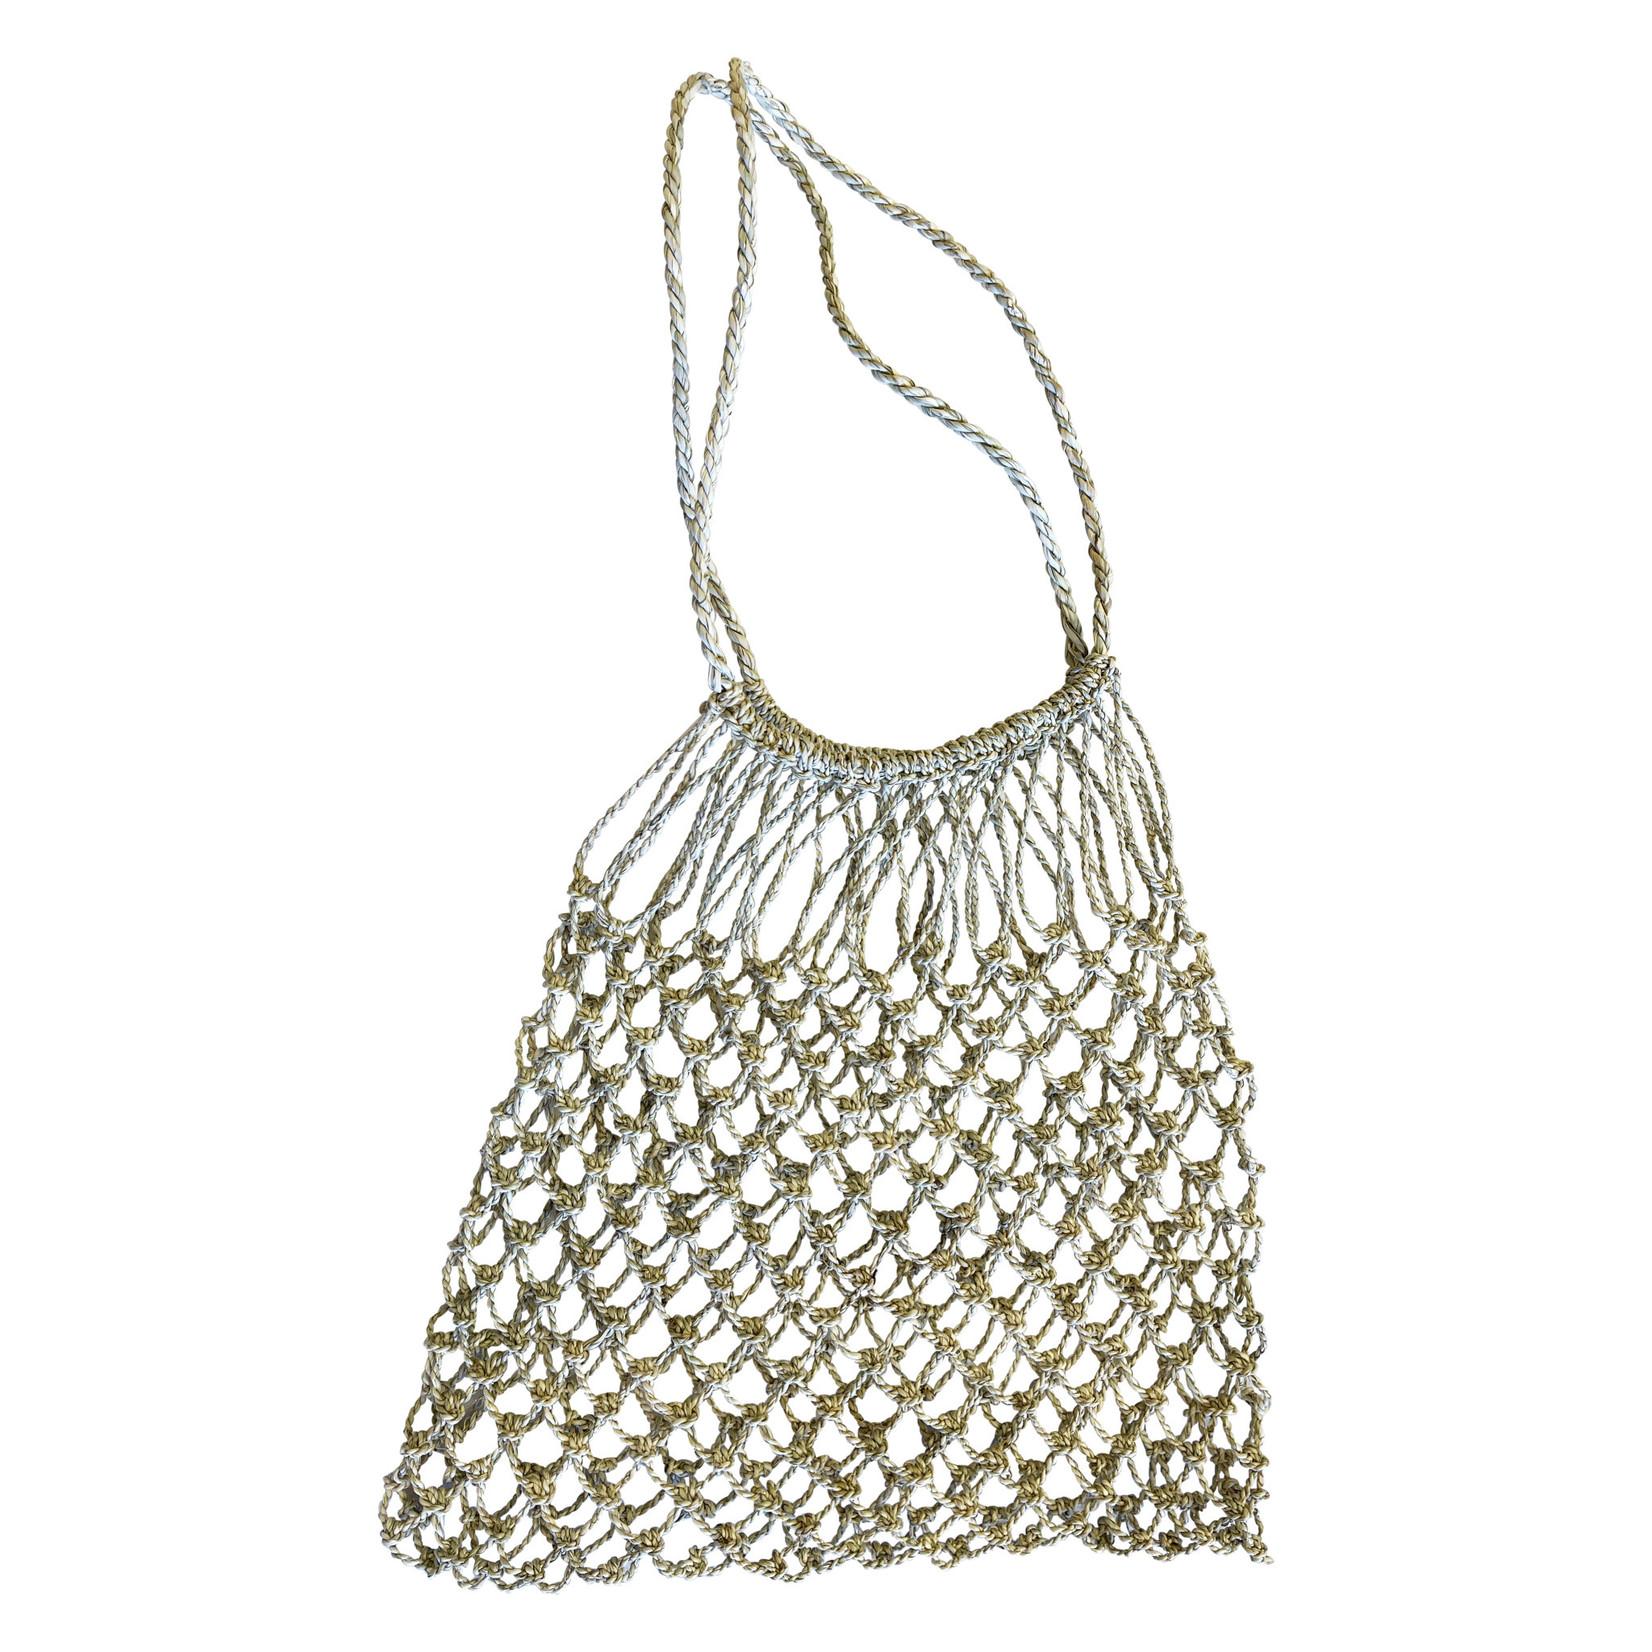 Prima de Sur. Triangle Bag